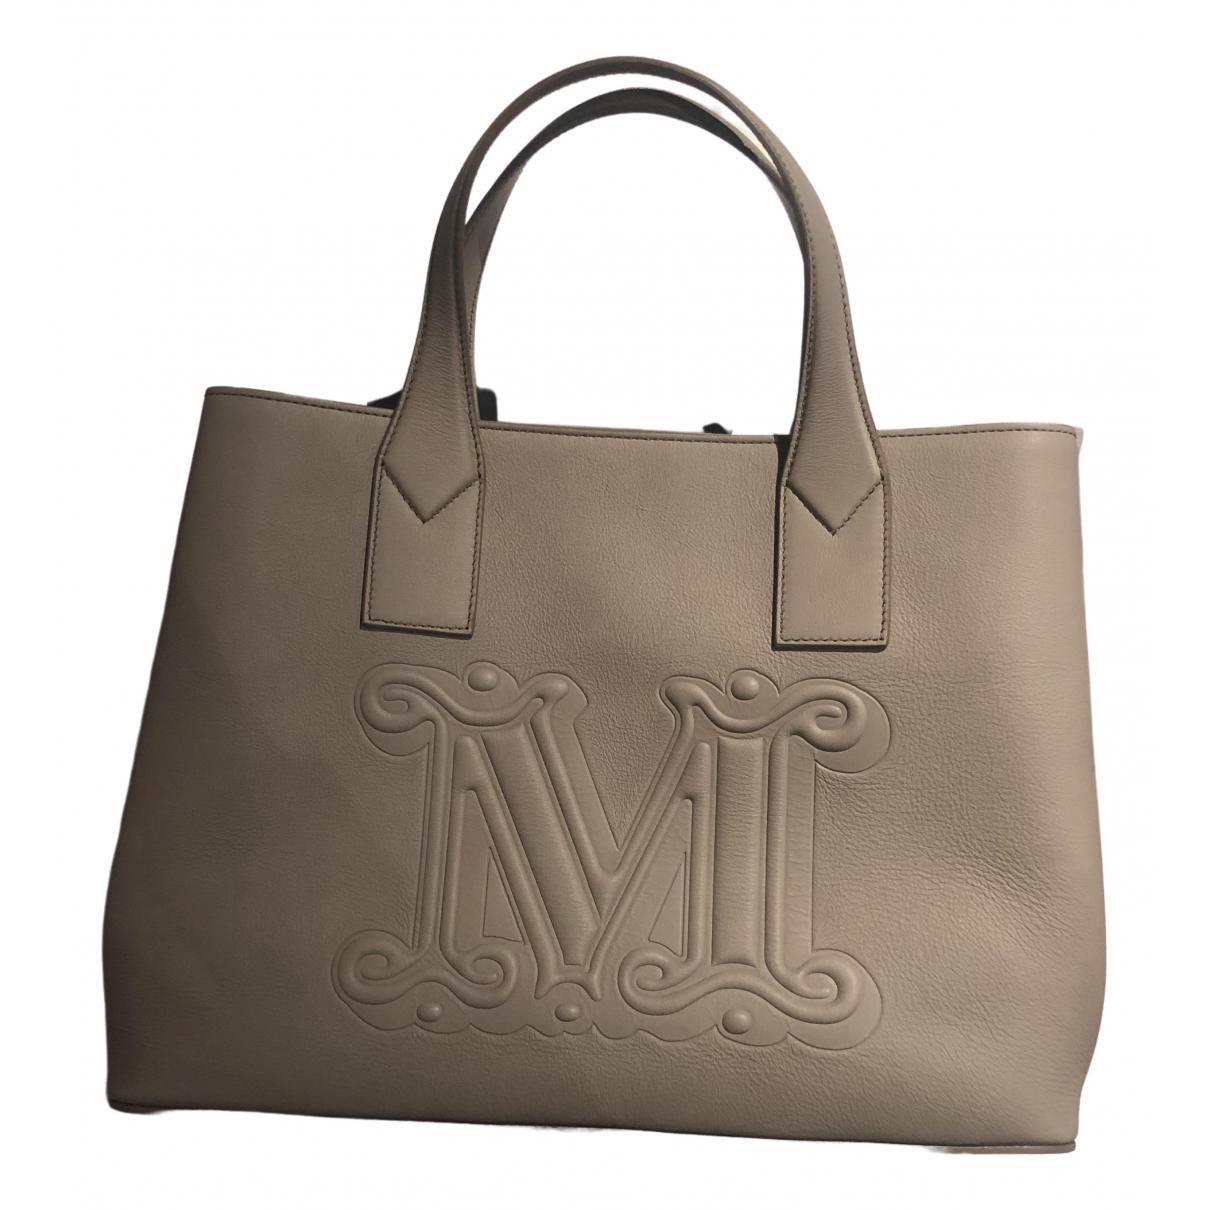 Max Mara \N Beige Leather handbag for Women \N